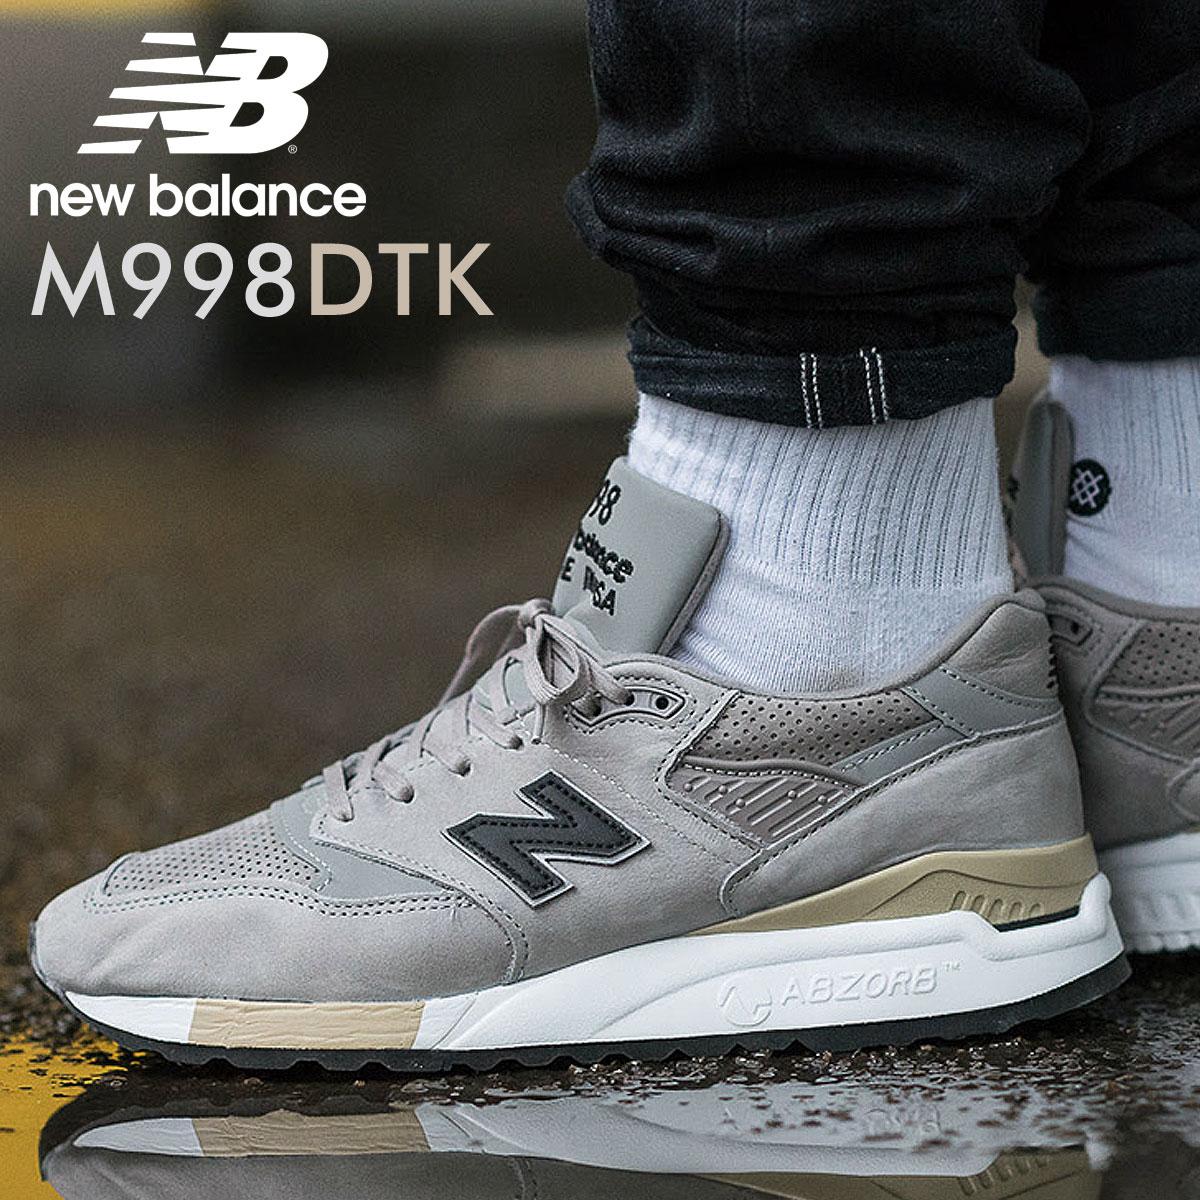 98b03ec67cfe new balance 998 men s New Balance sneakers M998DTK D Wise shoes gray  175